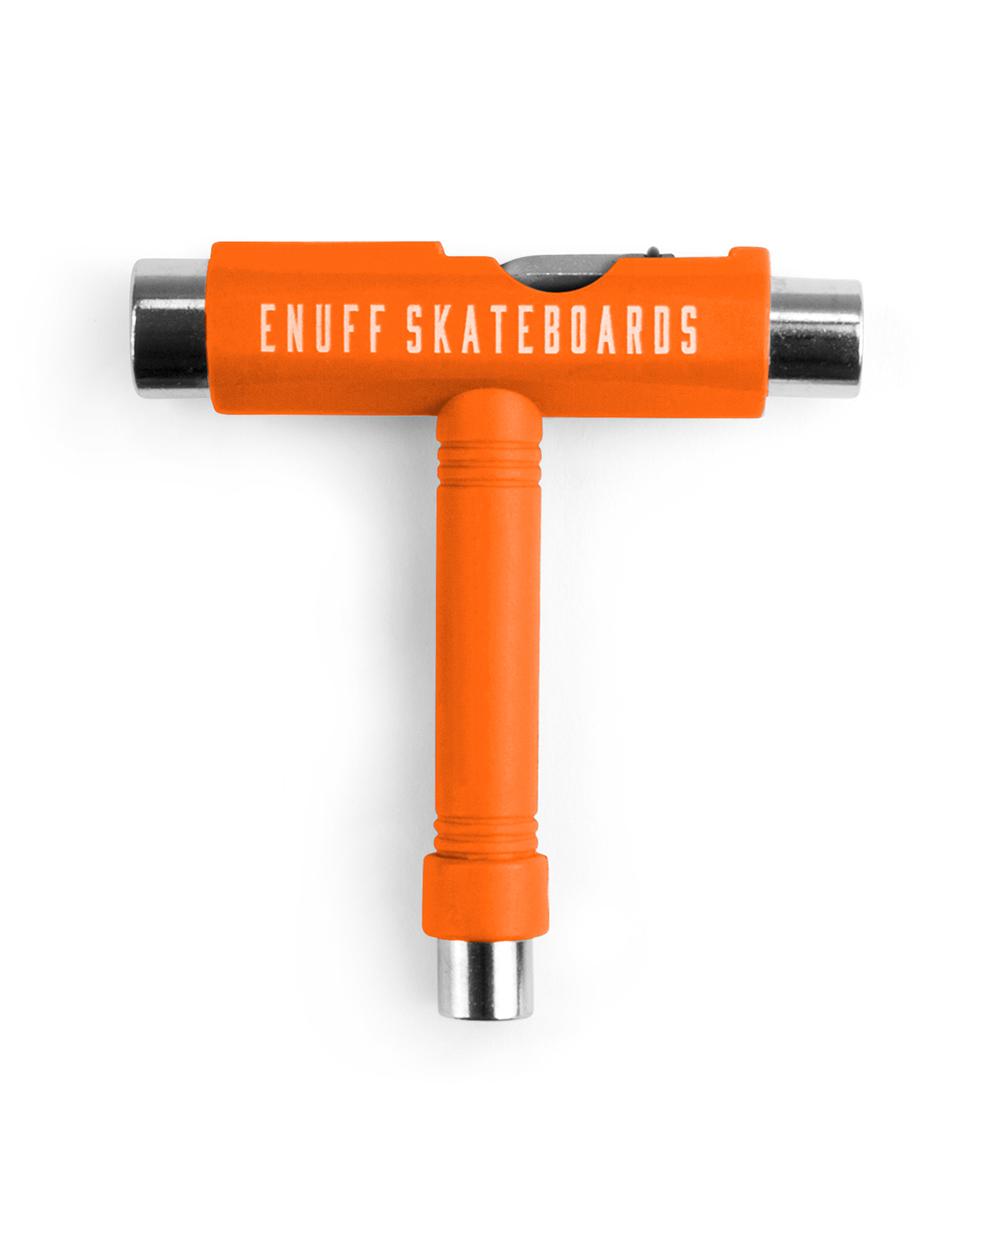 Enuff Essential Tool Skateboard Tool Orange